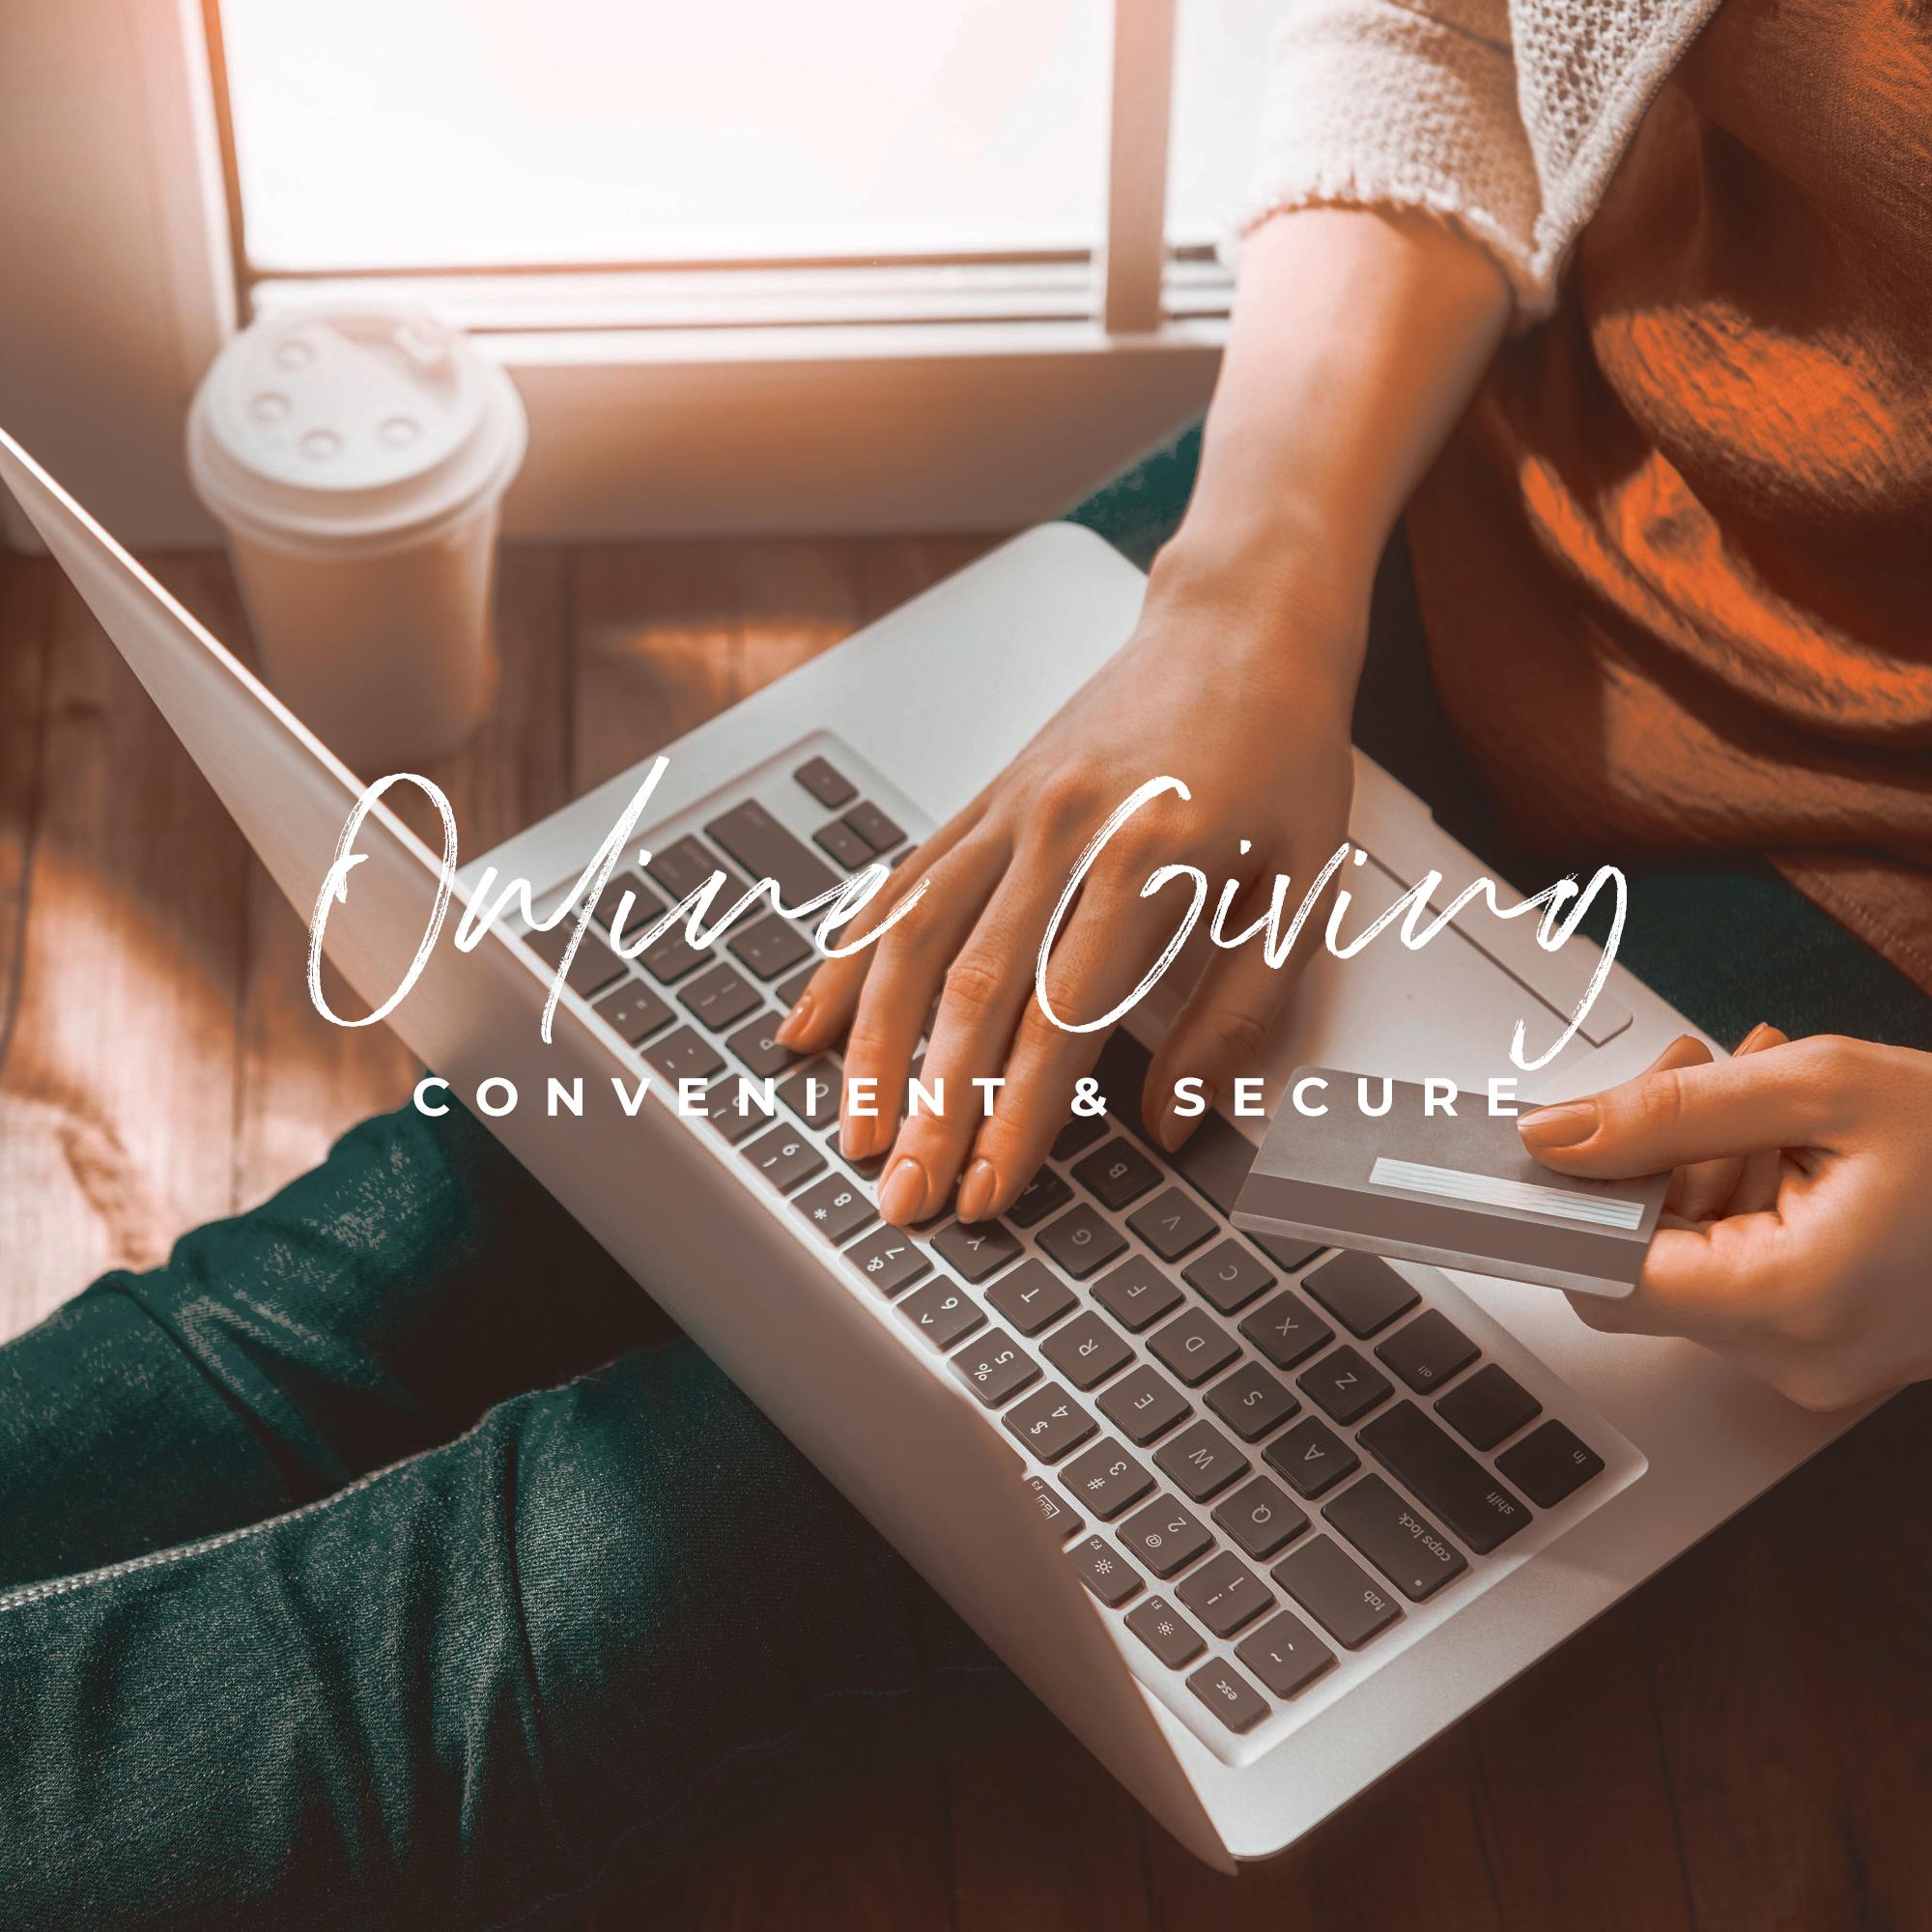 Online Giving Laptop Credit Card - Title.jpg